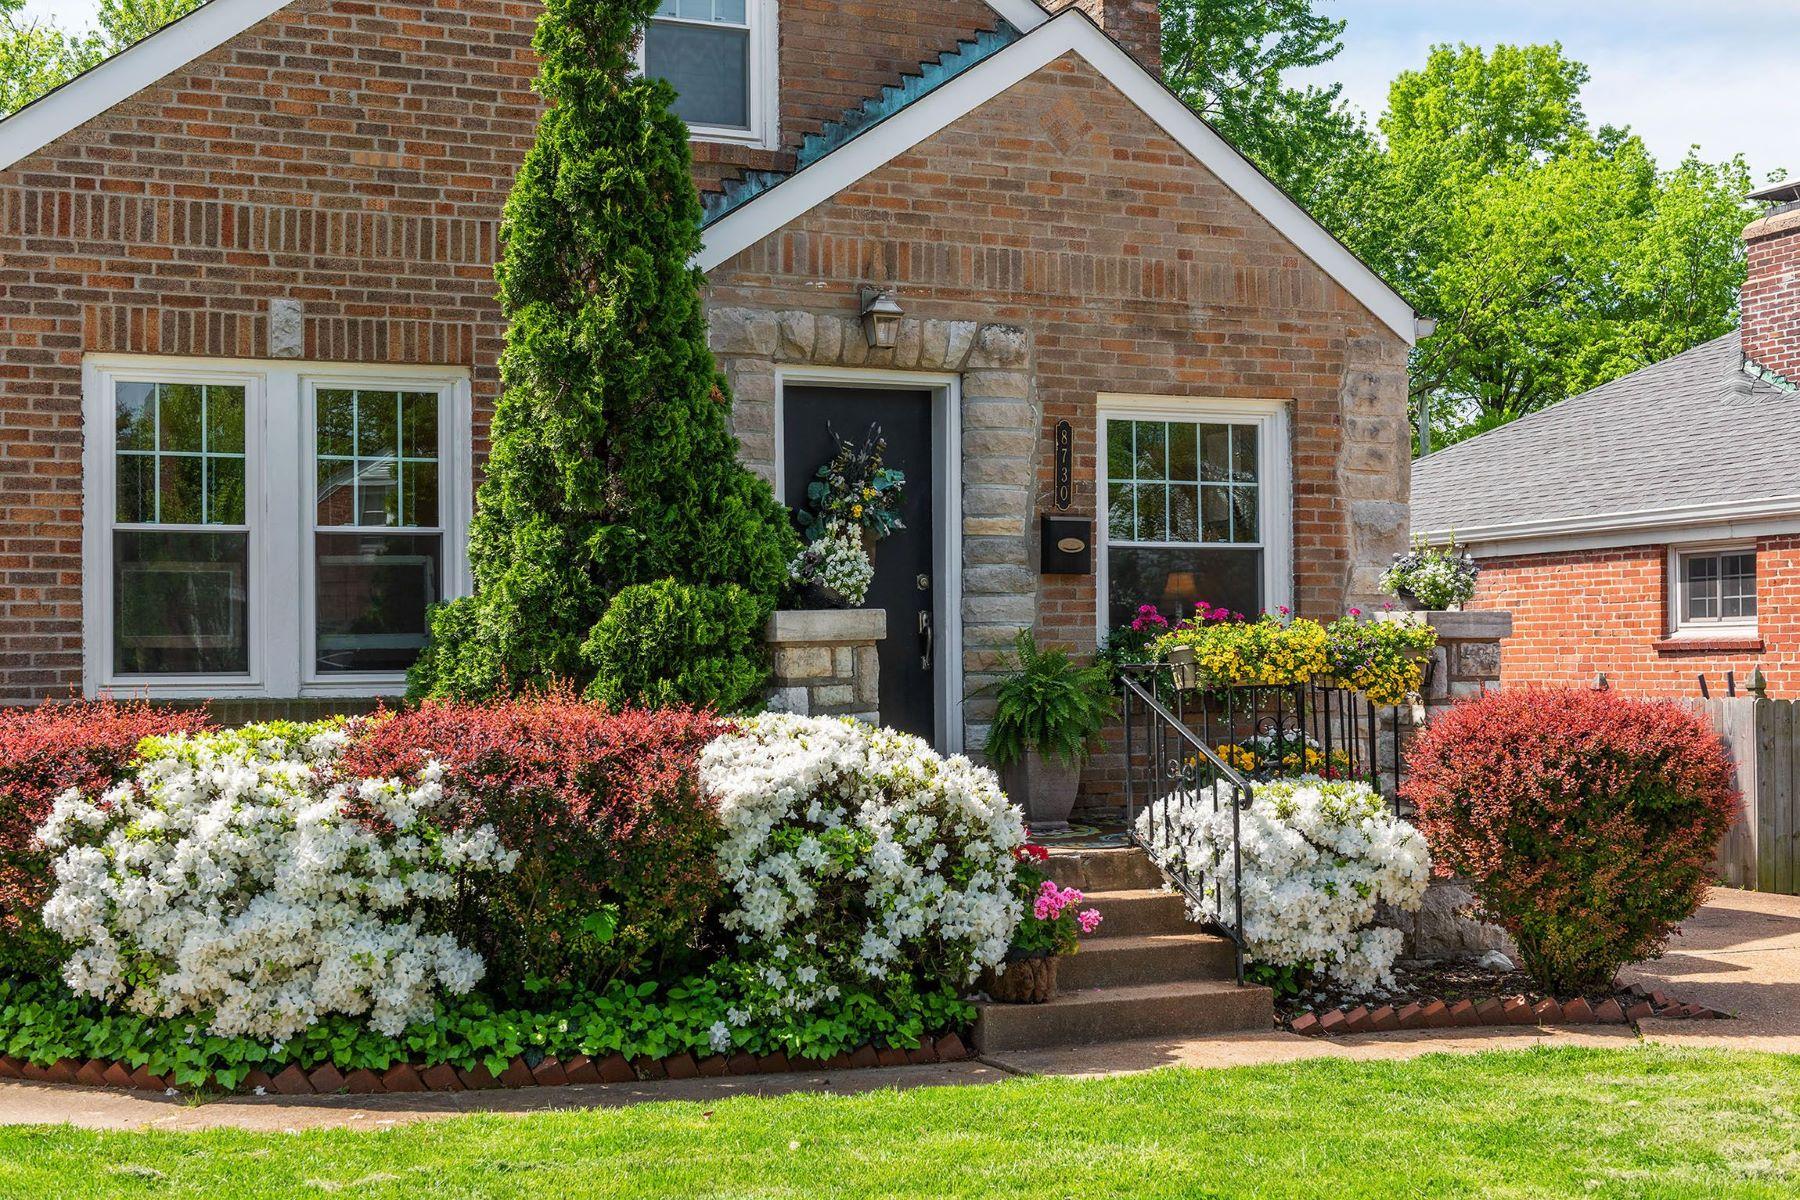 single family homes 为 销售 在 8730 Bridgeport Avenue 布洛特伍德, 密苏里州 63144 美国